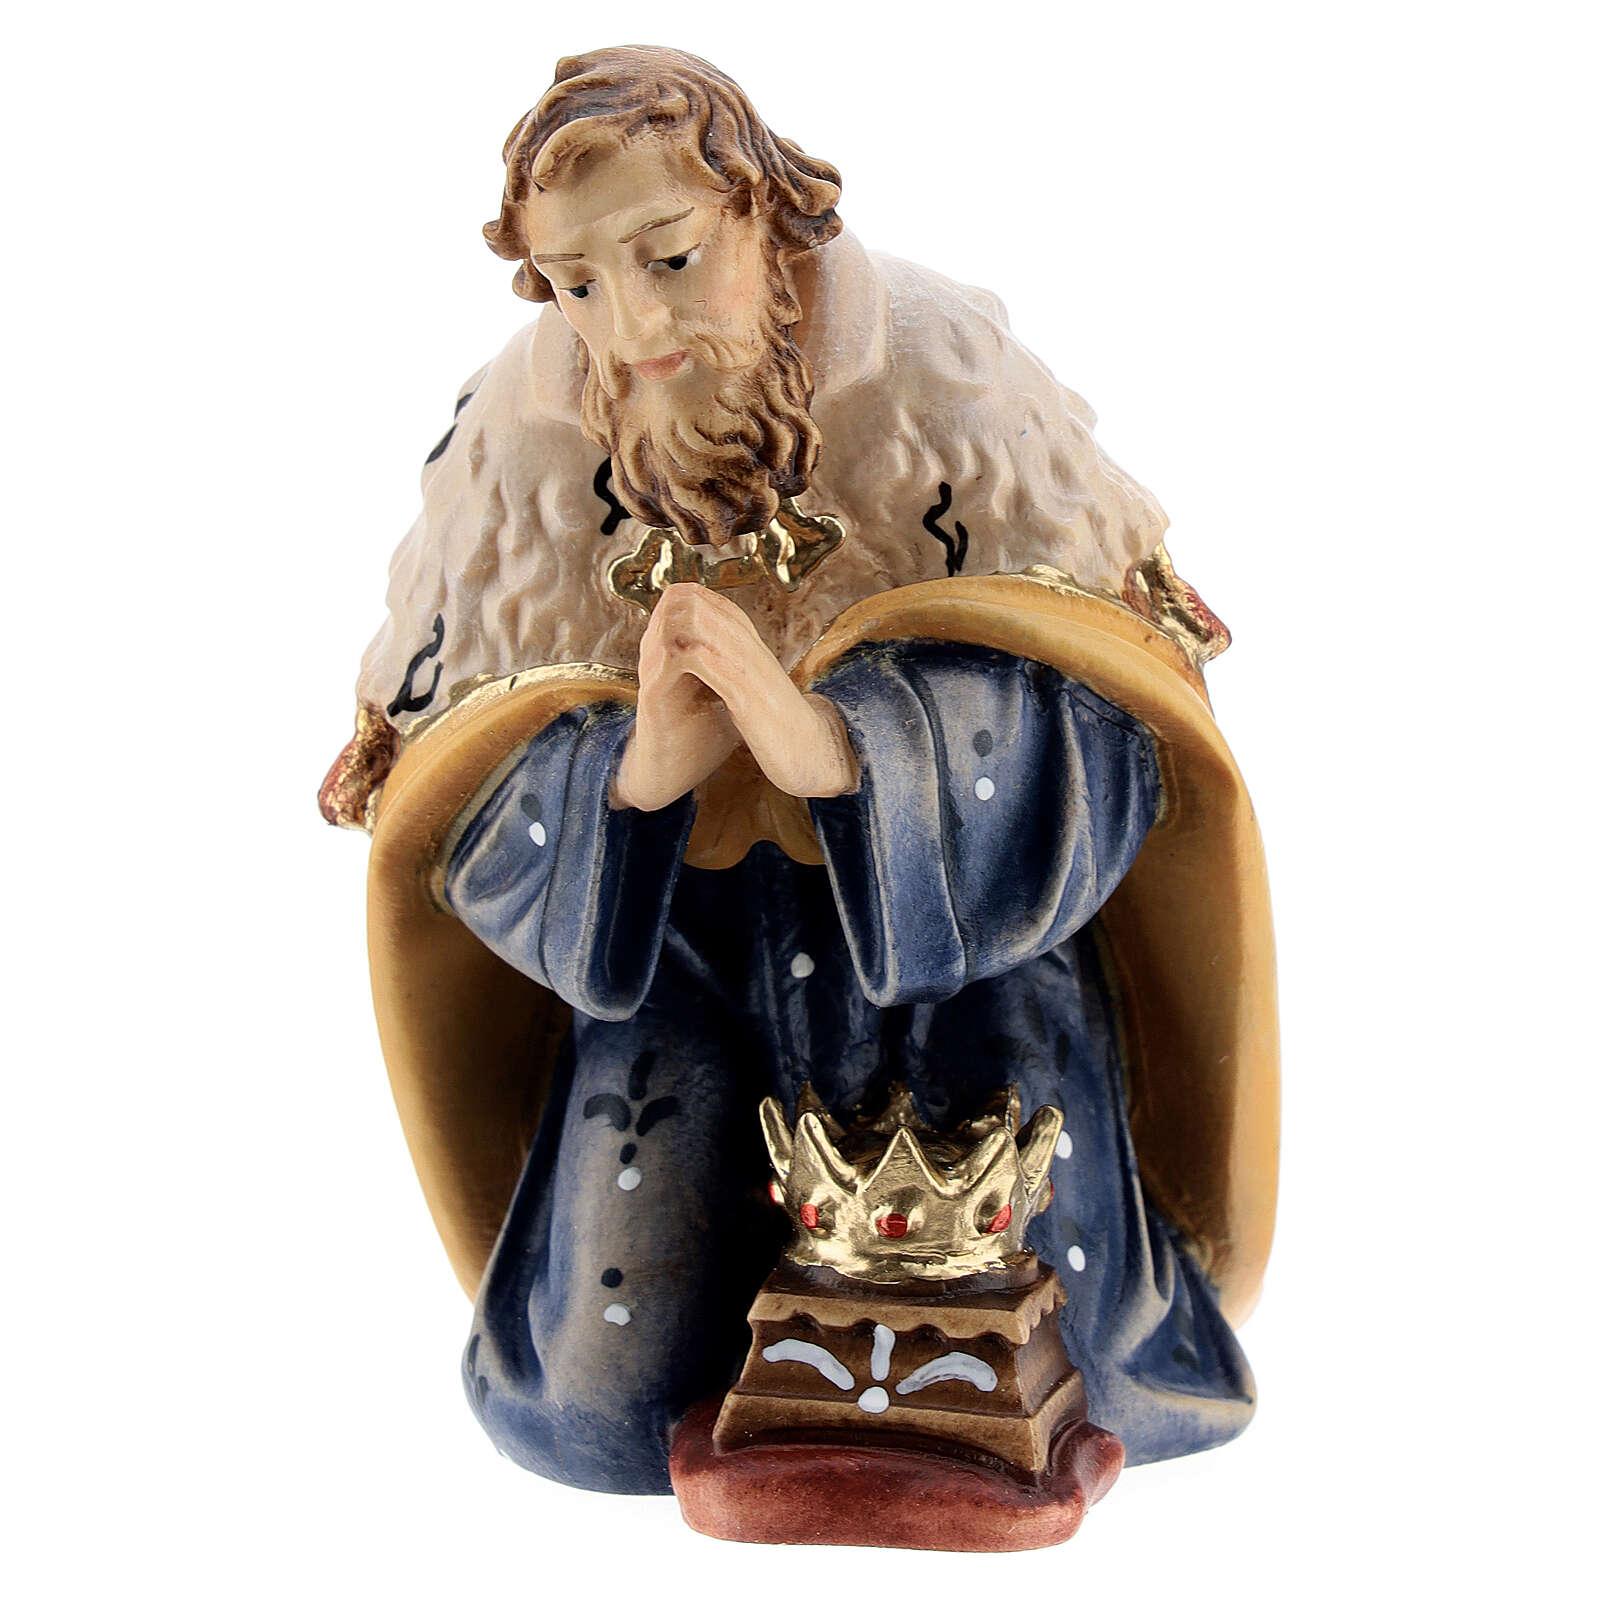 Kneeling king in painted wood for Kostner Nativity Scene 12 cm 4